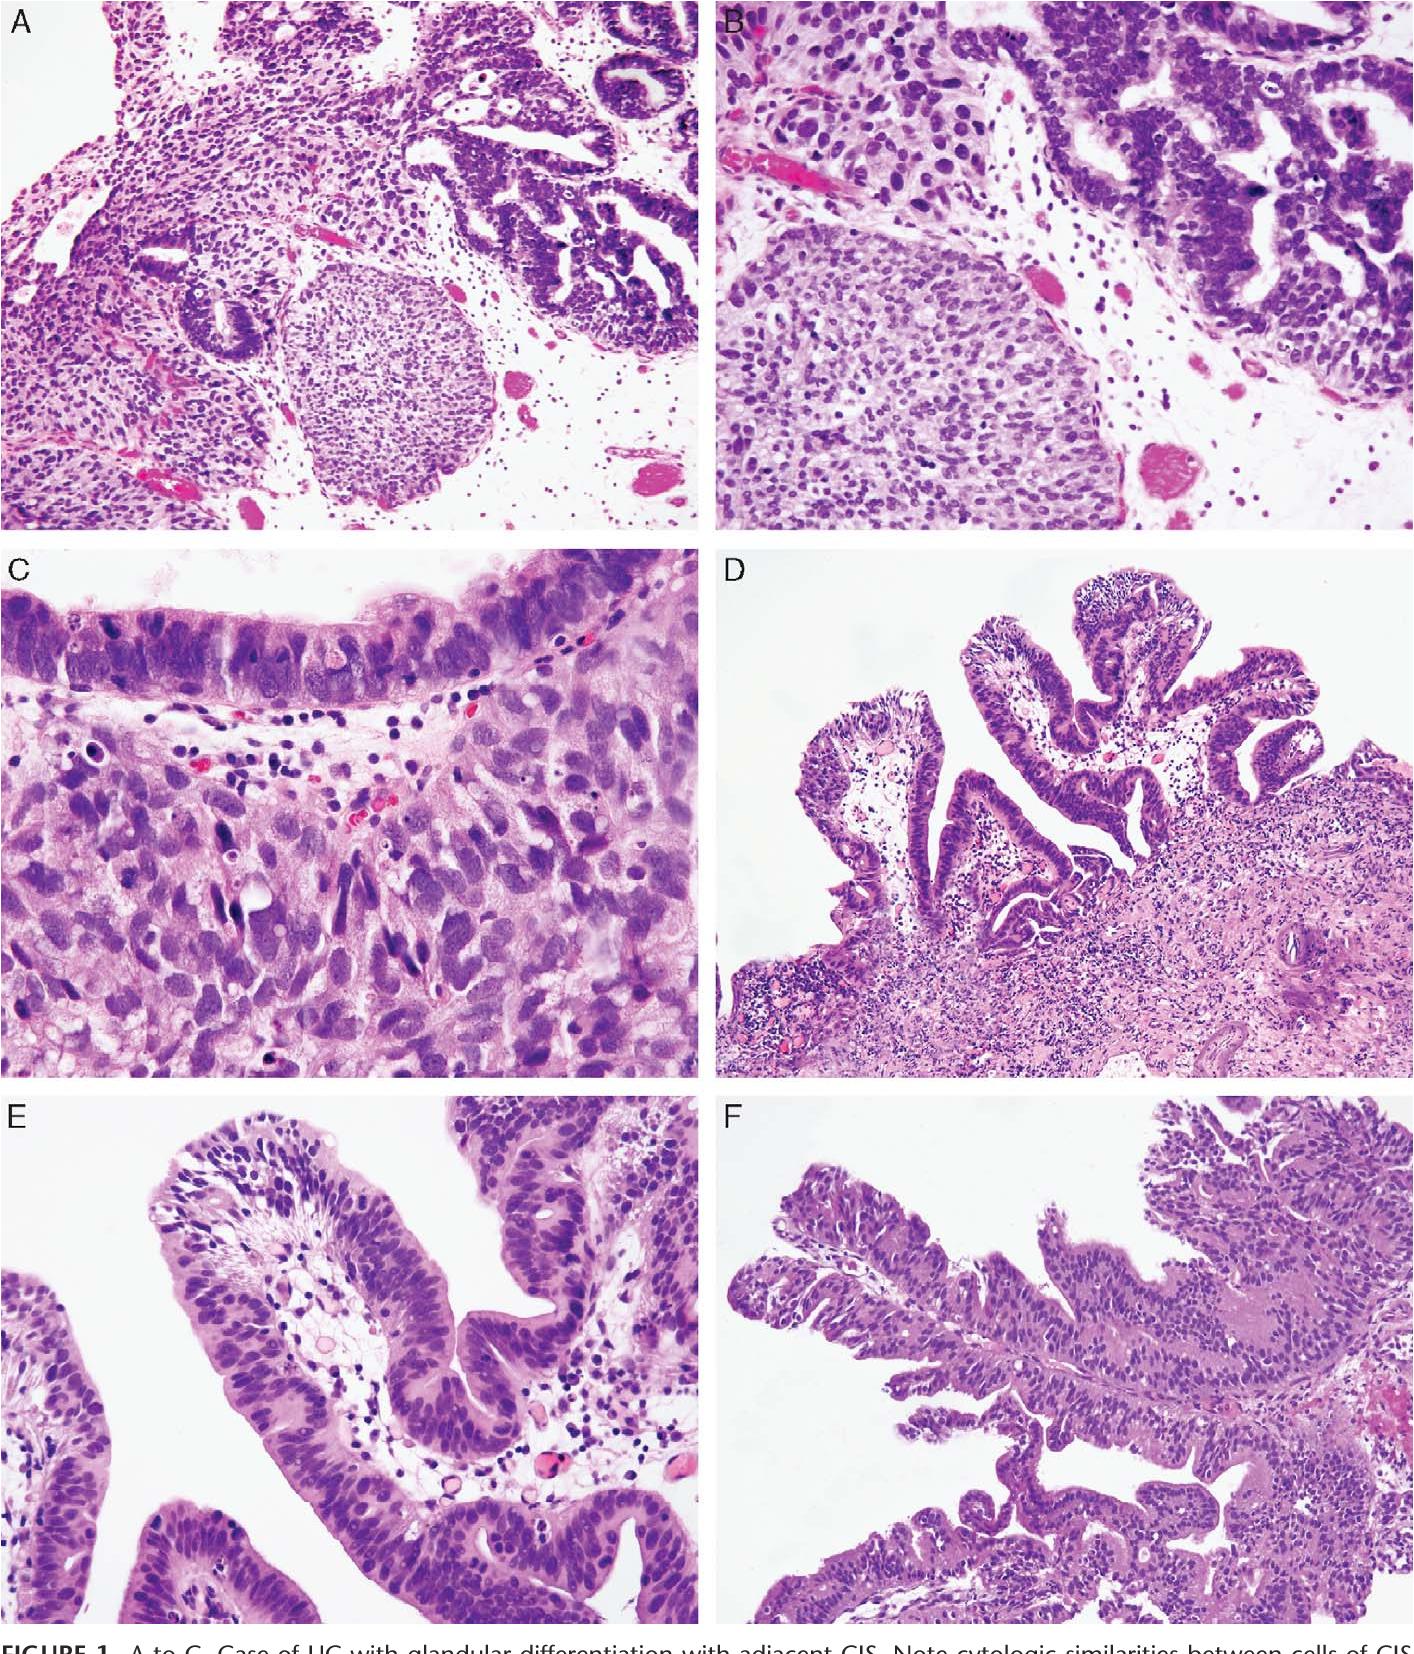 papillary urothelial carcinoma with glandular differentiation)